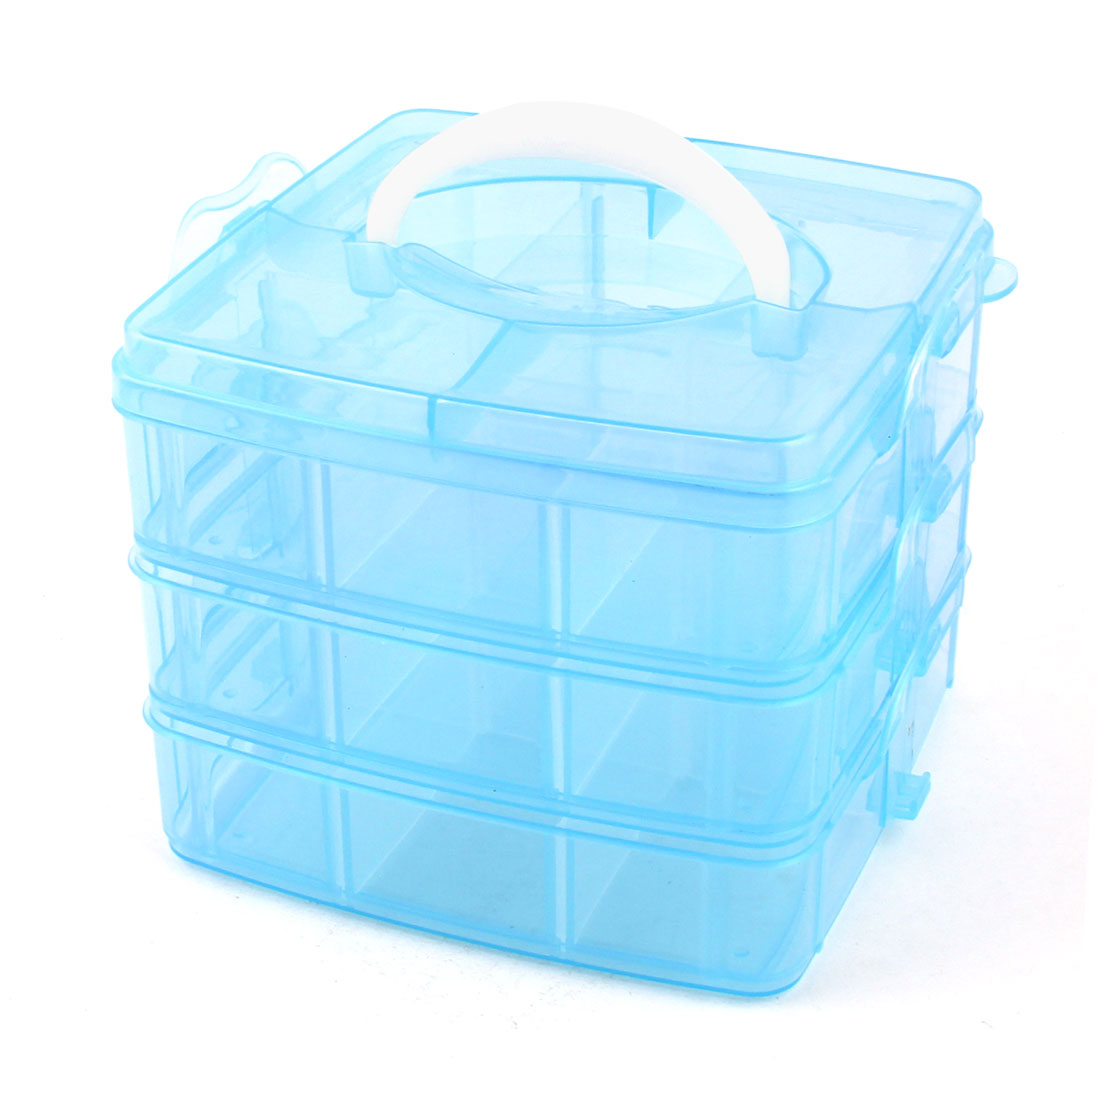 Unique Bargains Carry Handle 3 Layers 18 Compartments Separable Storage Case Container Blue